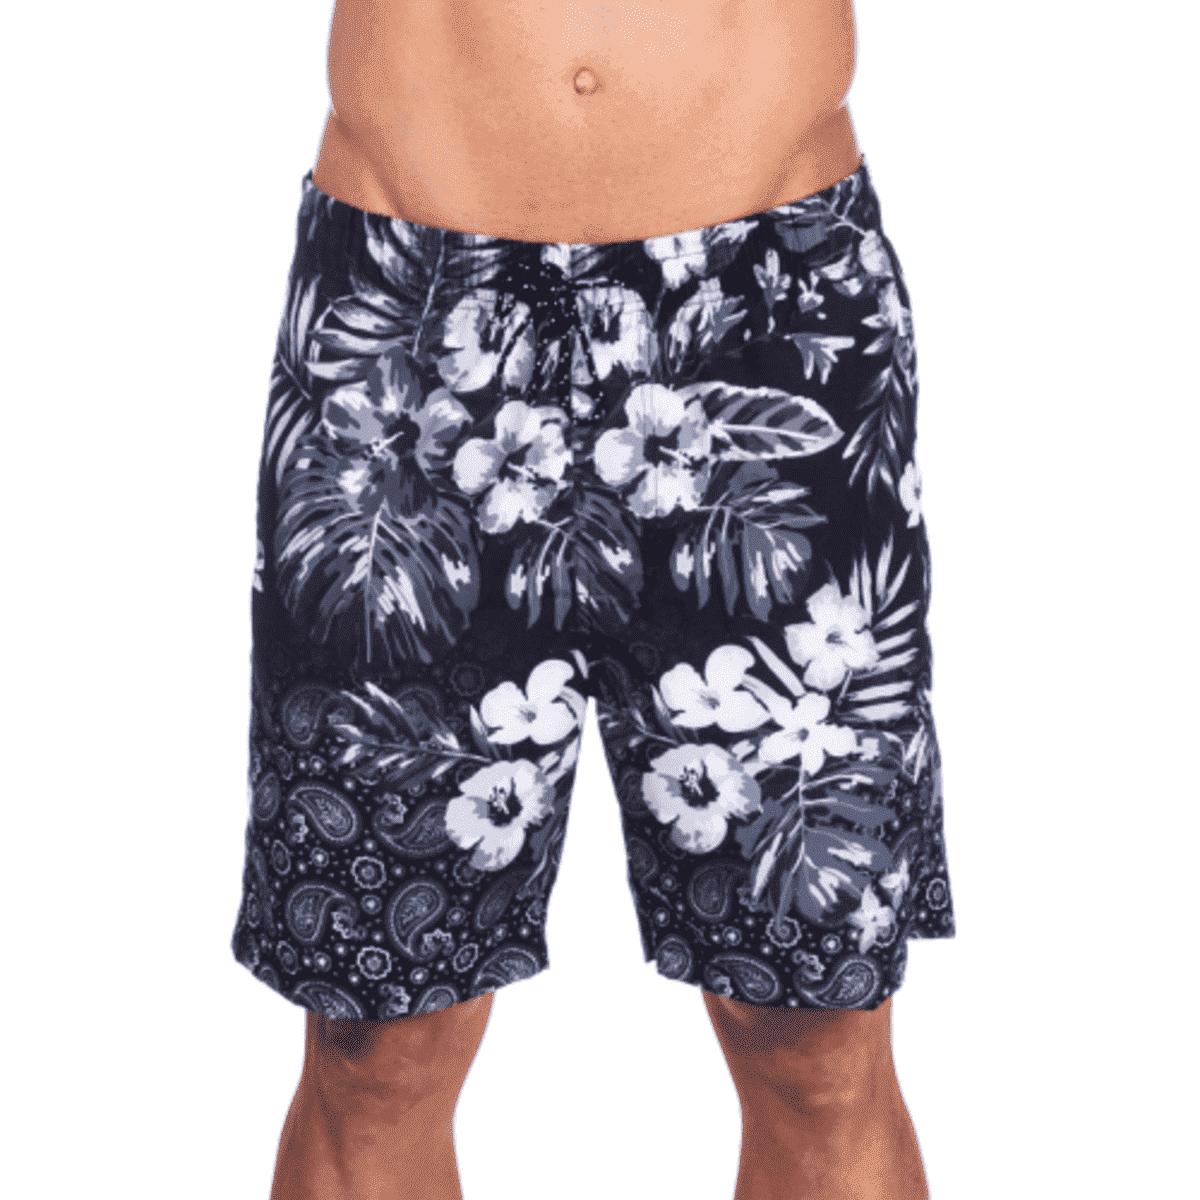 Kit 8 Short Bermuda Moletom Masculina Florida Floral Atacado